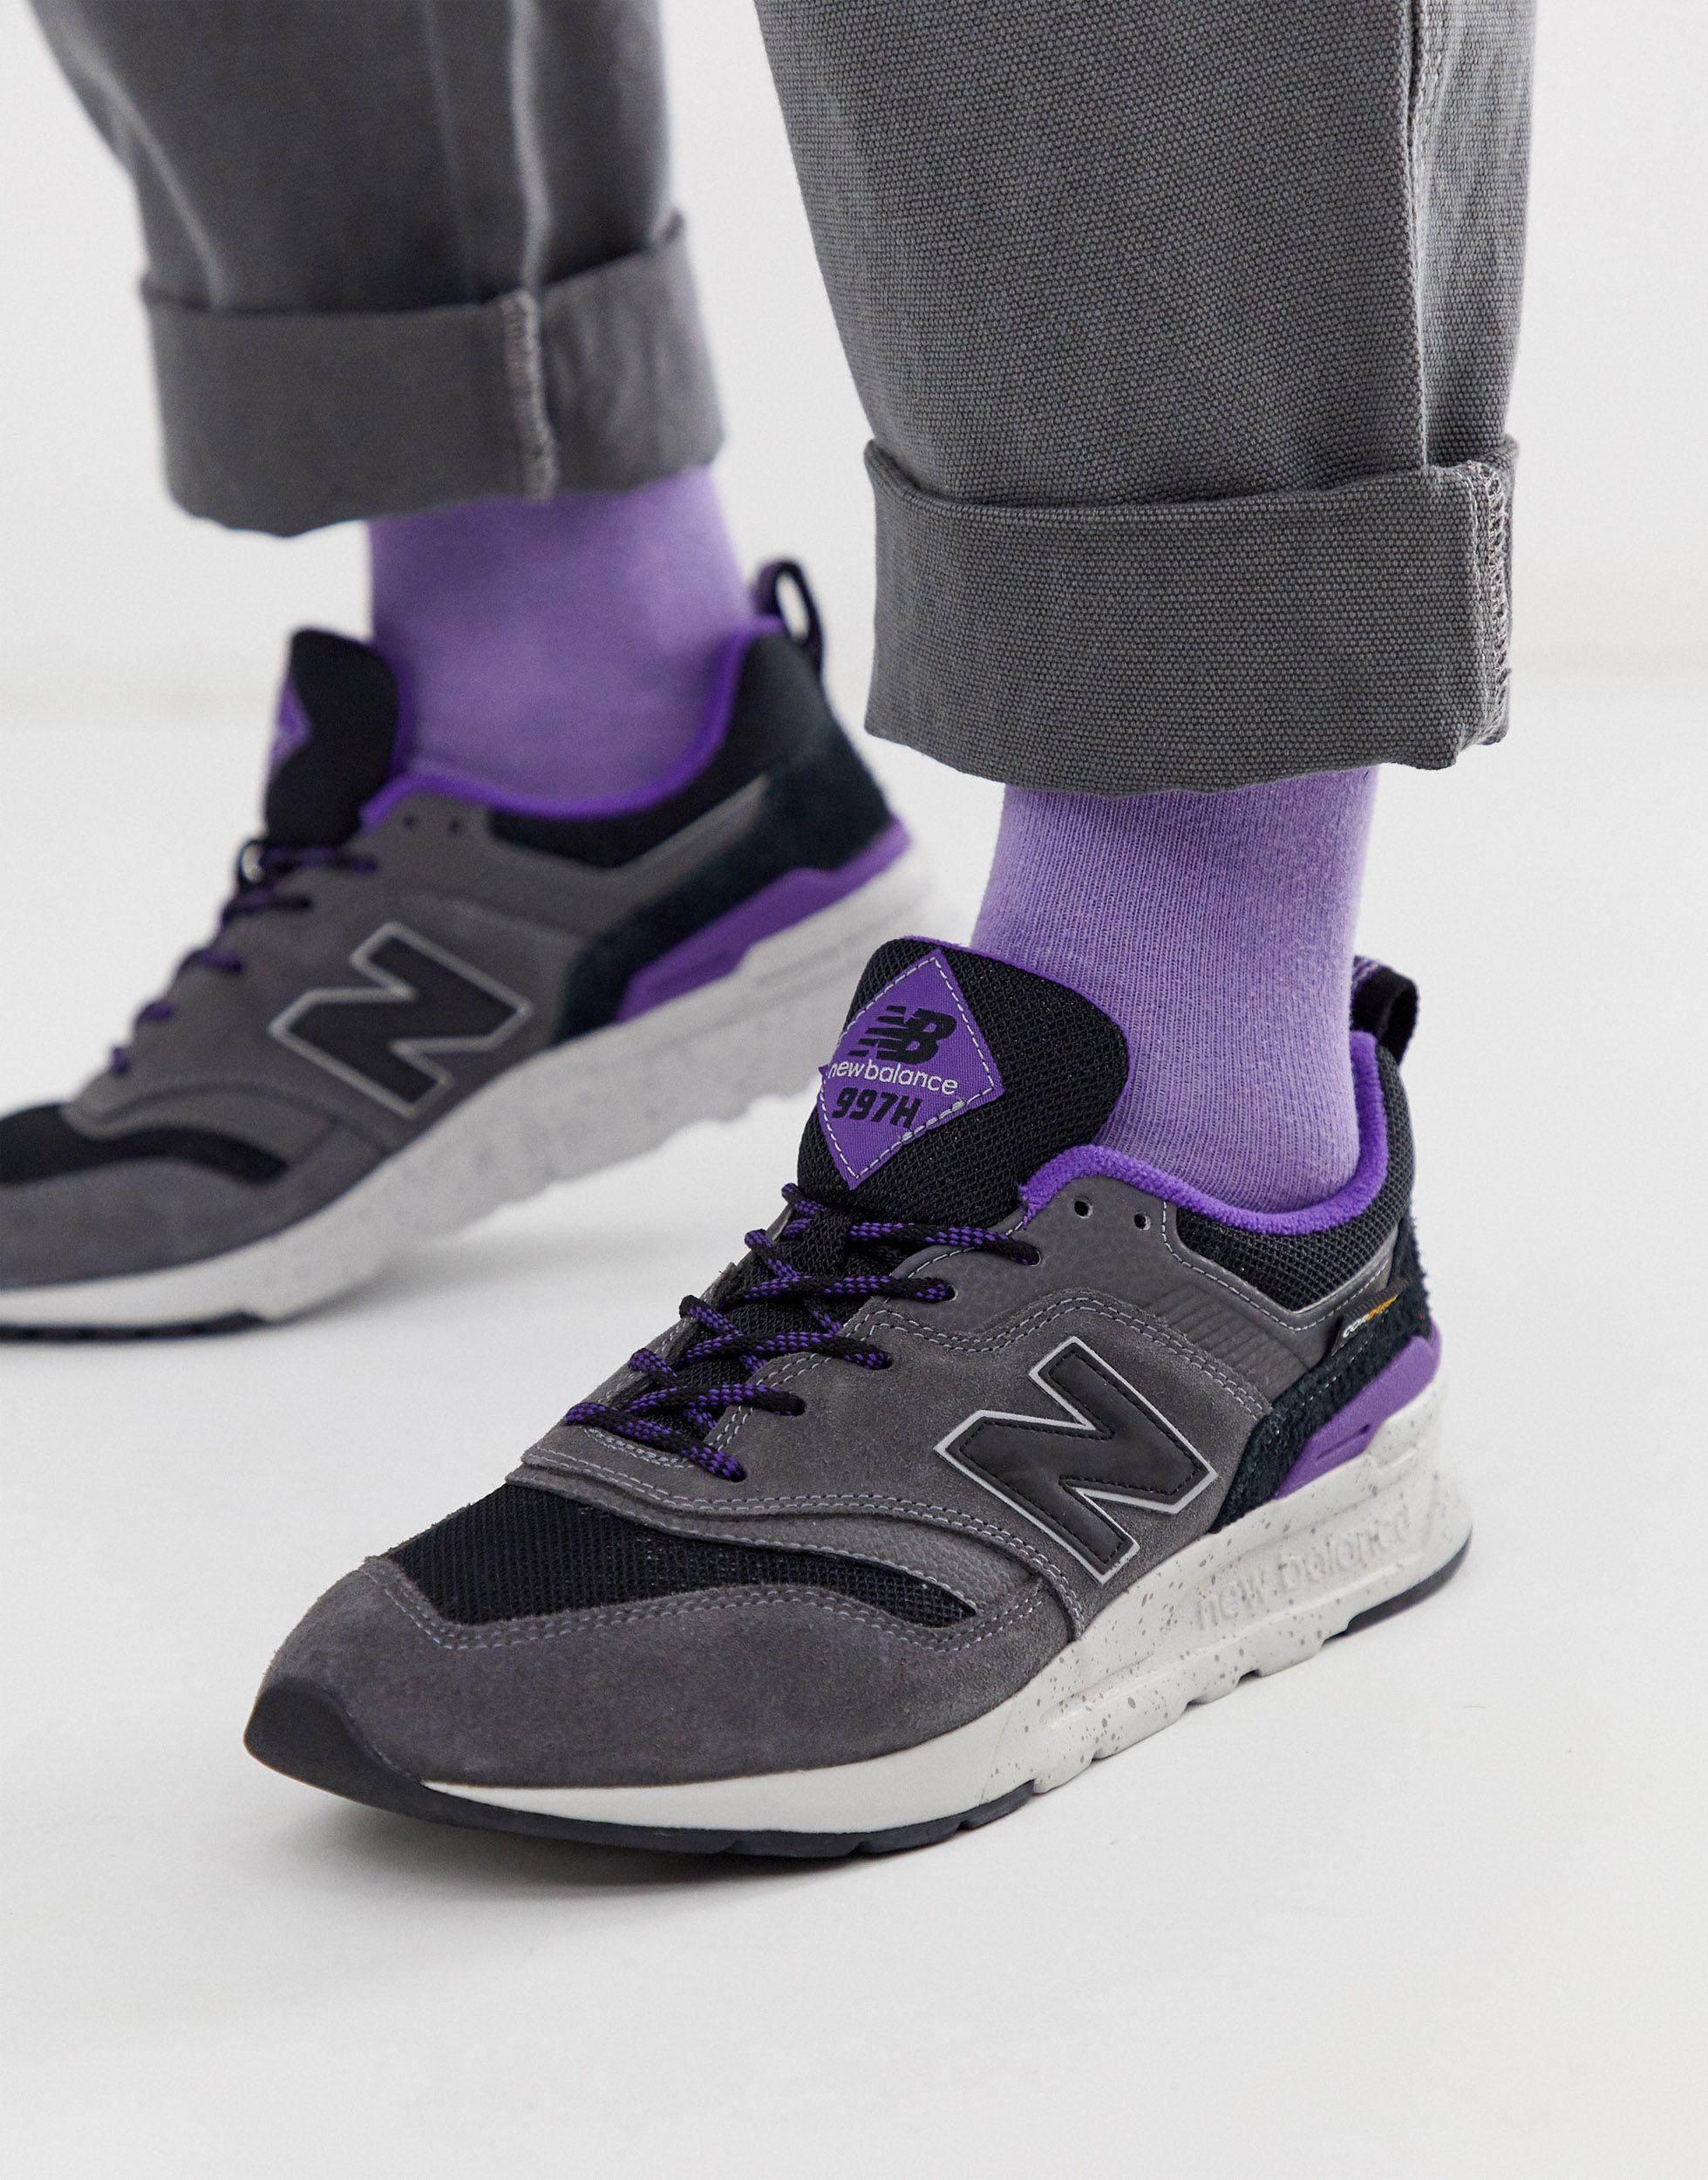 new balance 997h uomo cordura